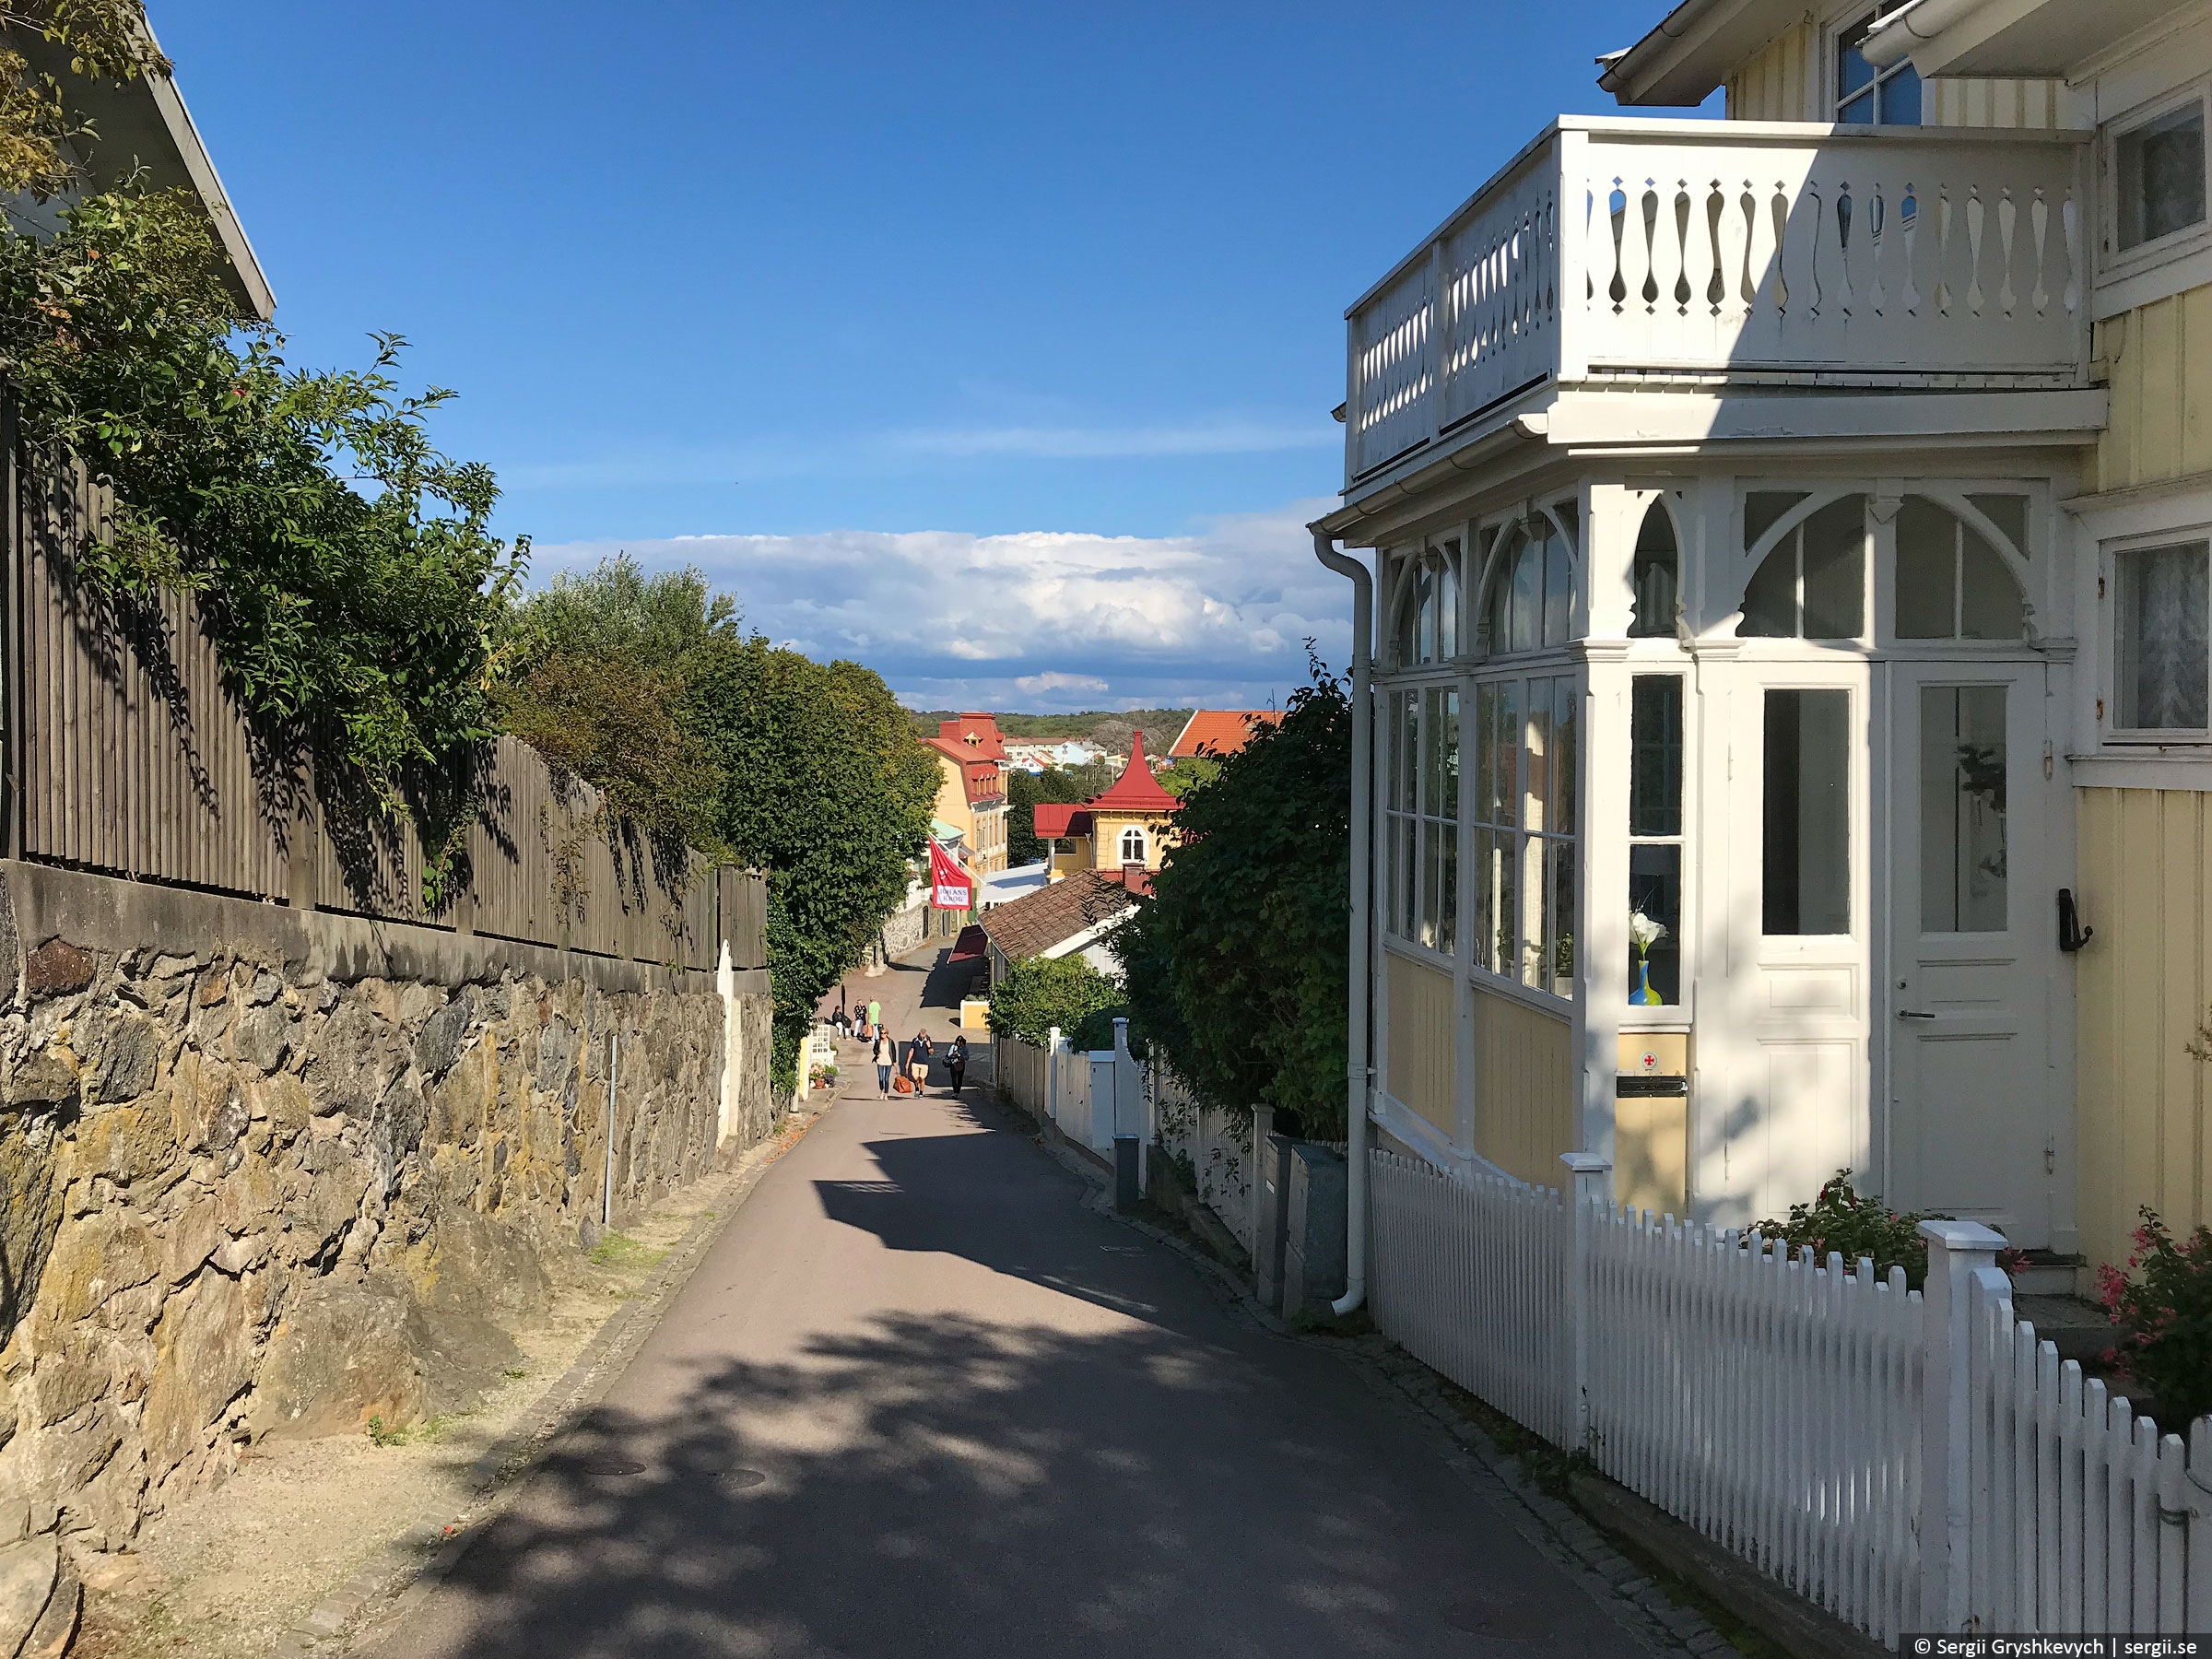 west-coast-sweden-2018-5